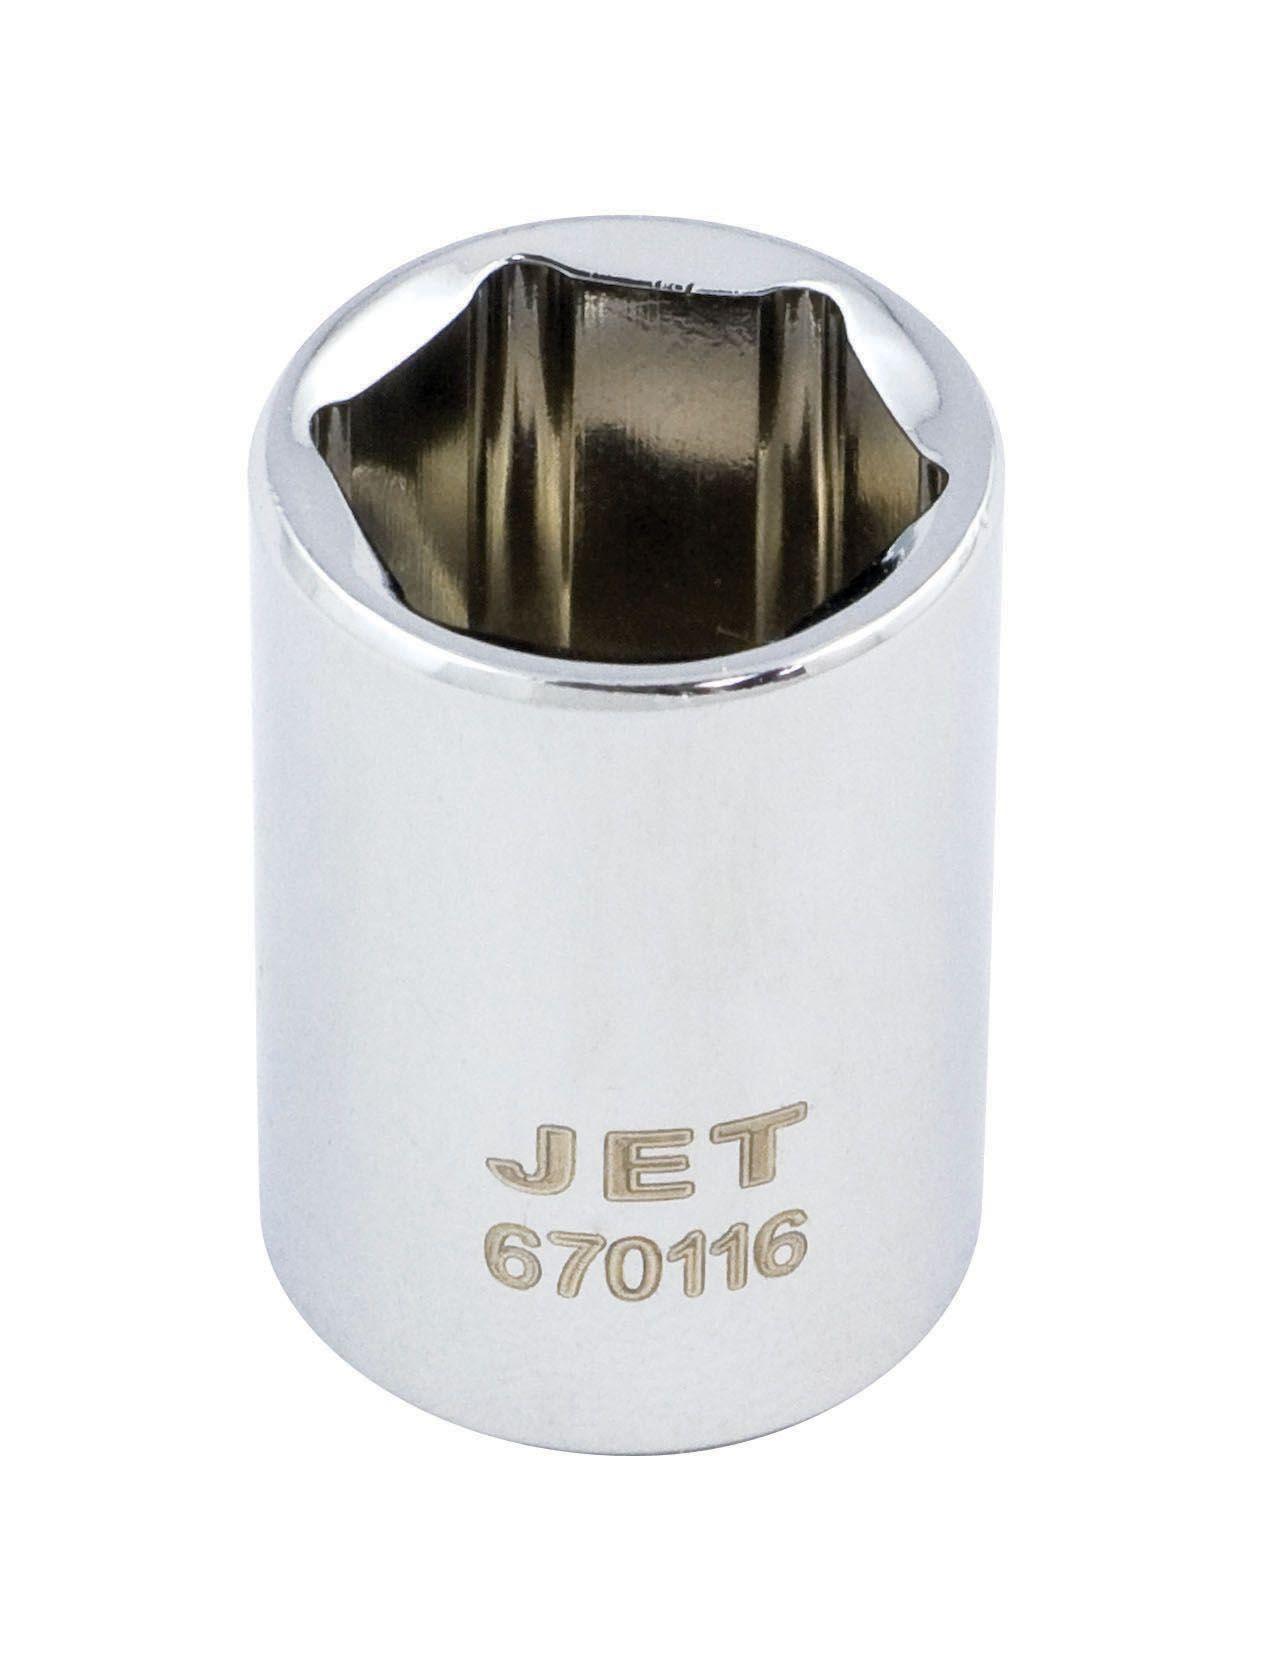 Jet 670110 Douille 5/16